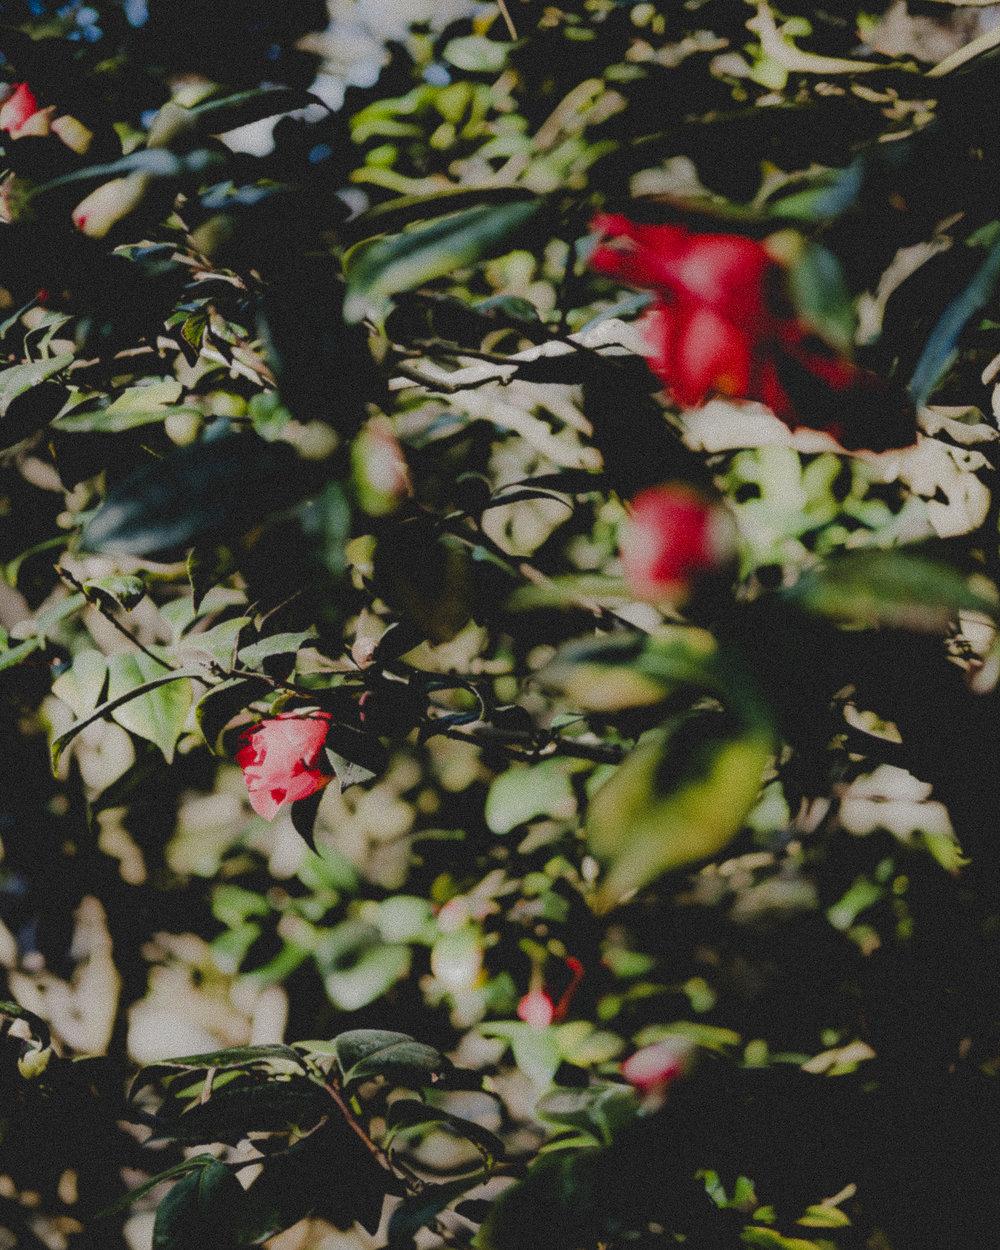 WA-Jardin-5198.jpg